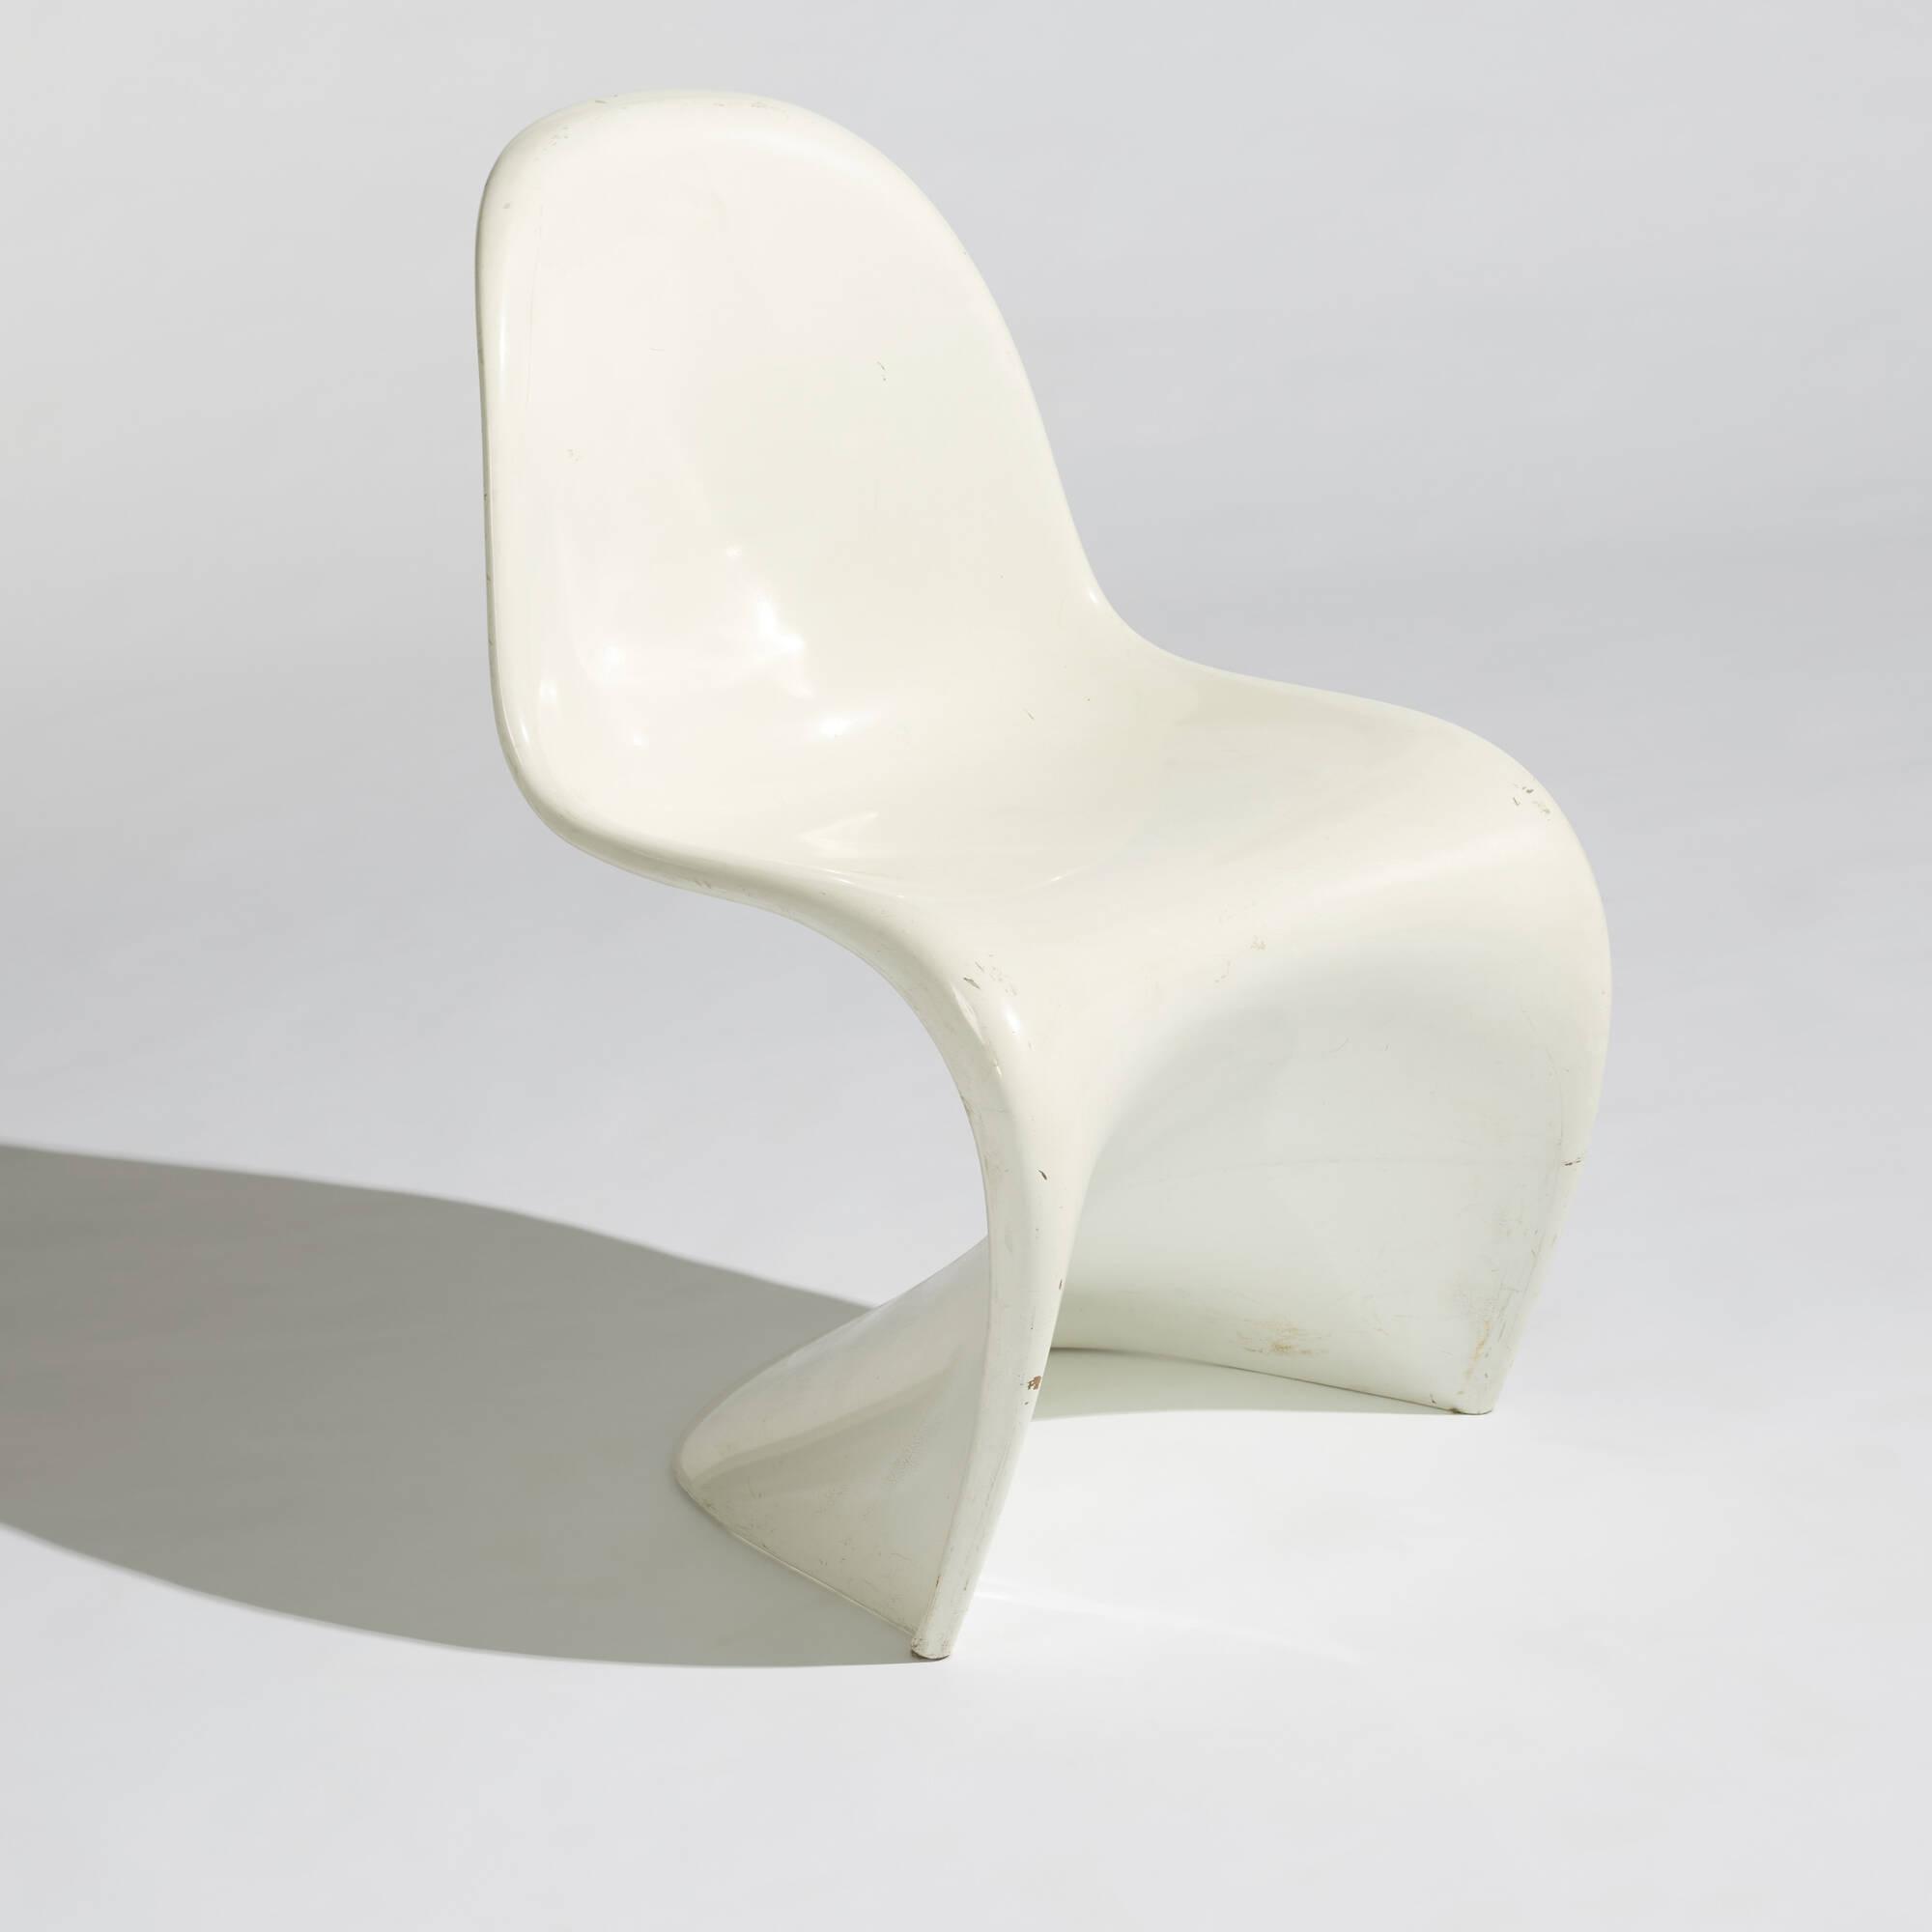 Verner Panton Panton Chair 246 verner panton panton chairs pair scandinavian design 18